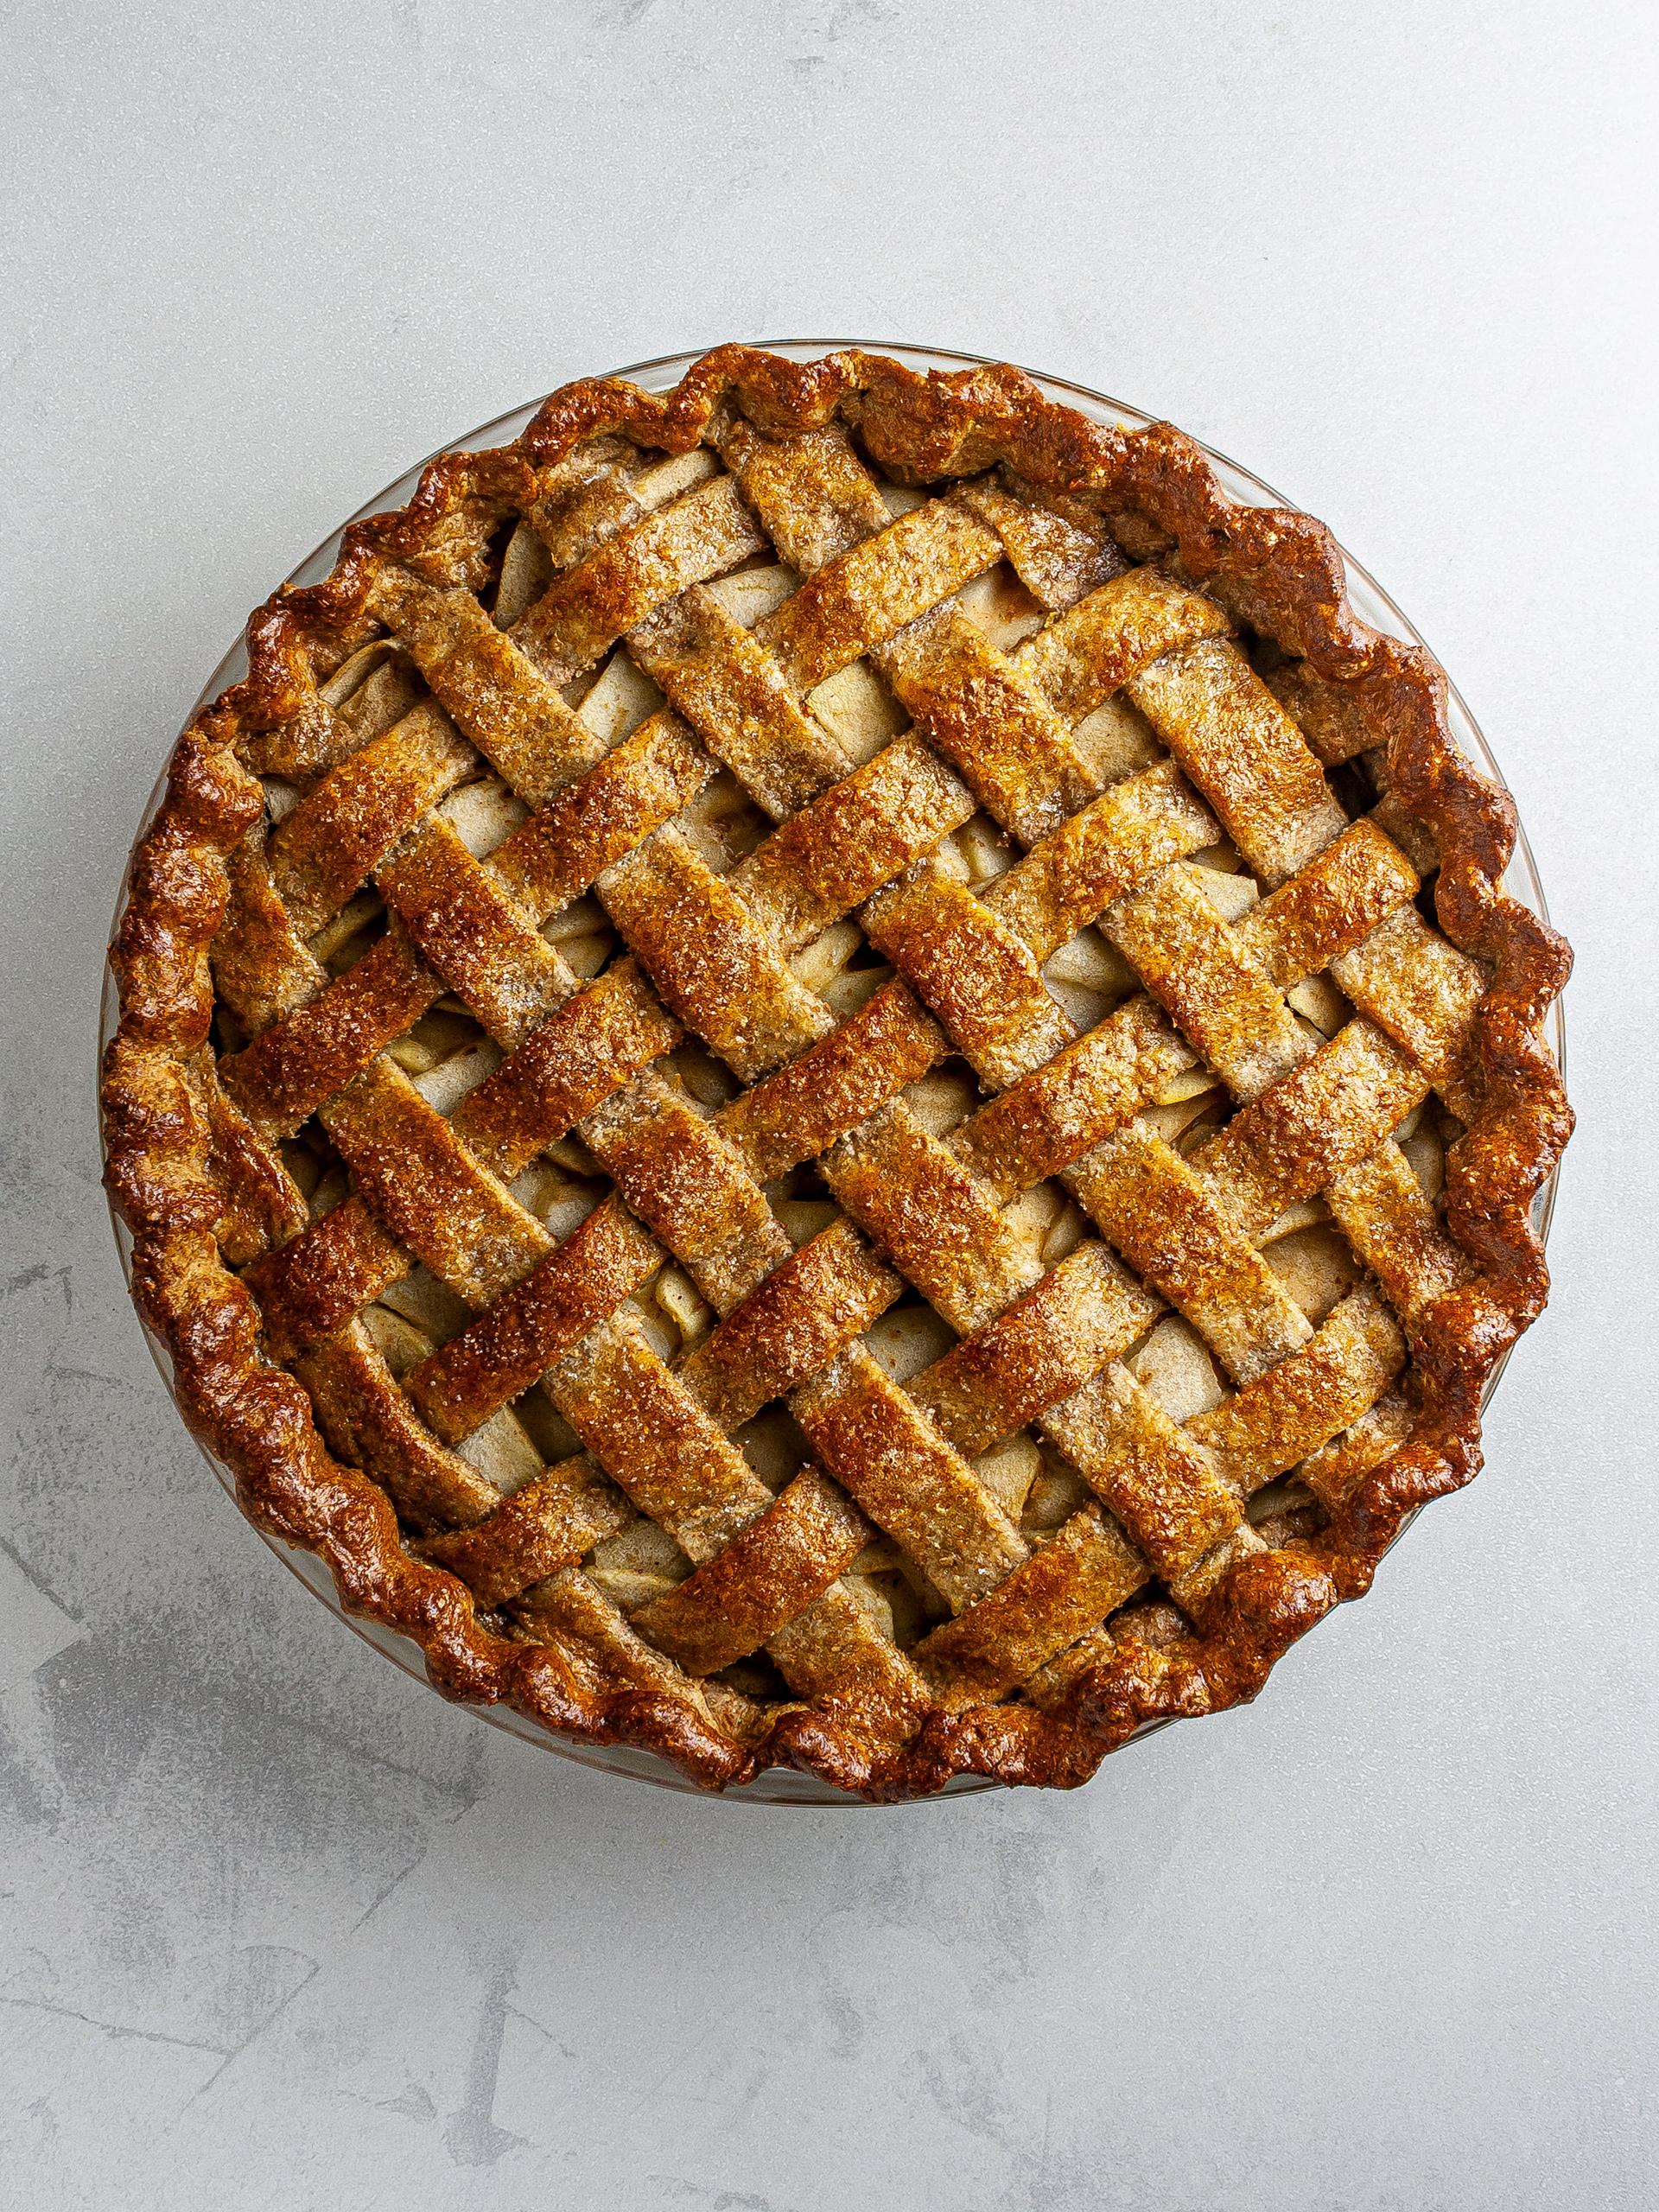 Step 5.2 of Vegan Apple Pie Recipe